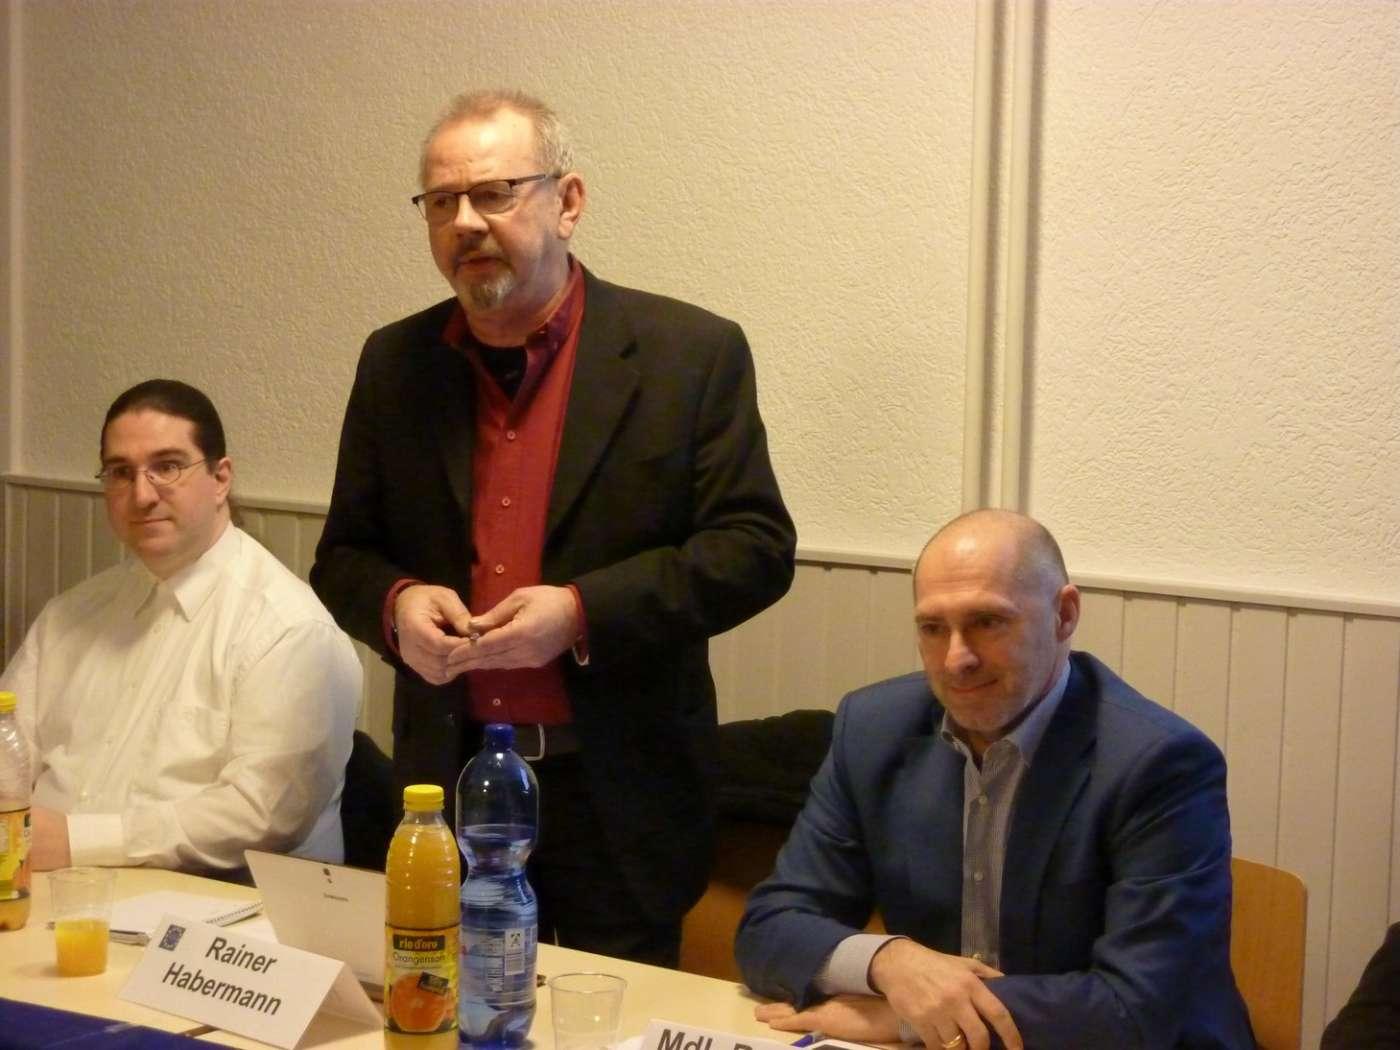 vlnr: Kai Lanio (Piratenpartei), Moderator Rainer Habermann, René Rock